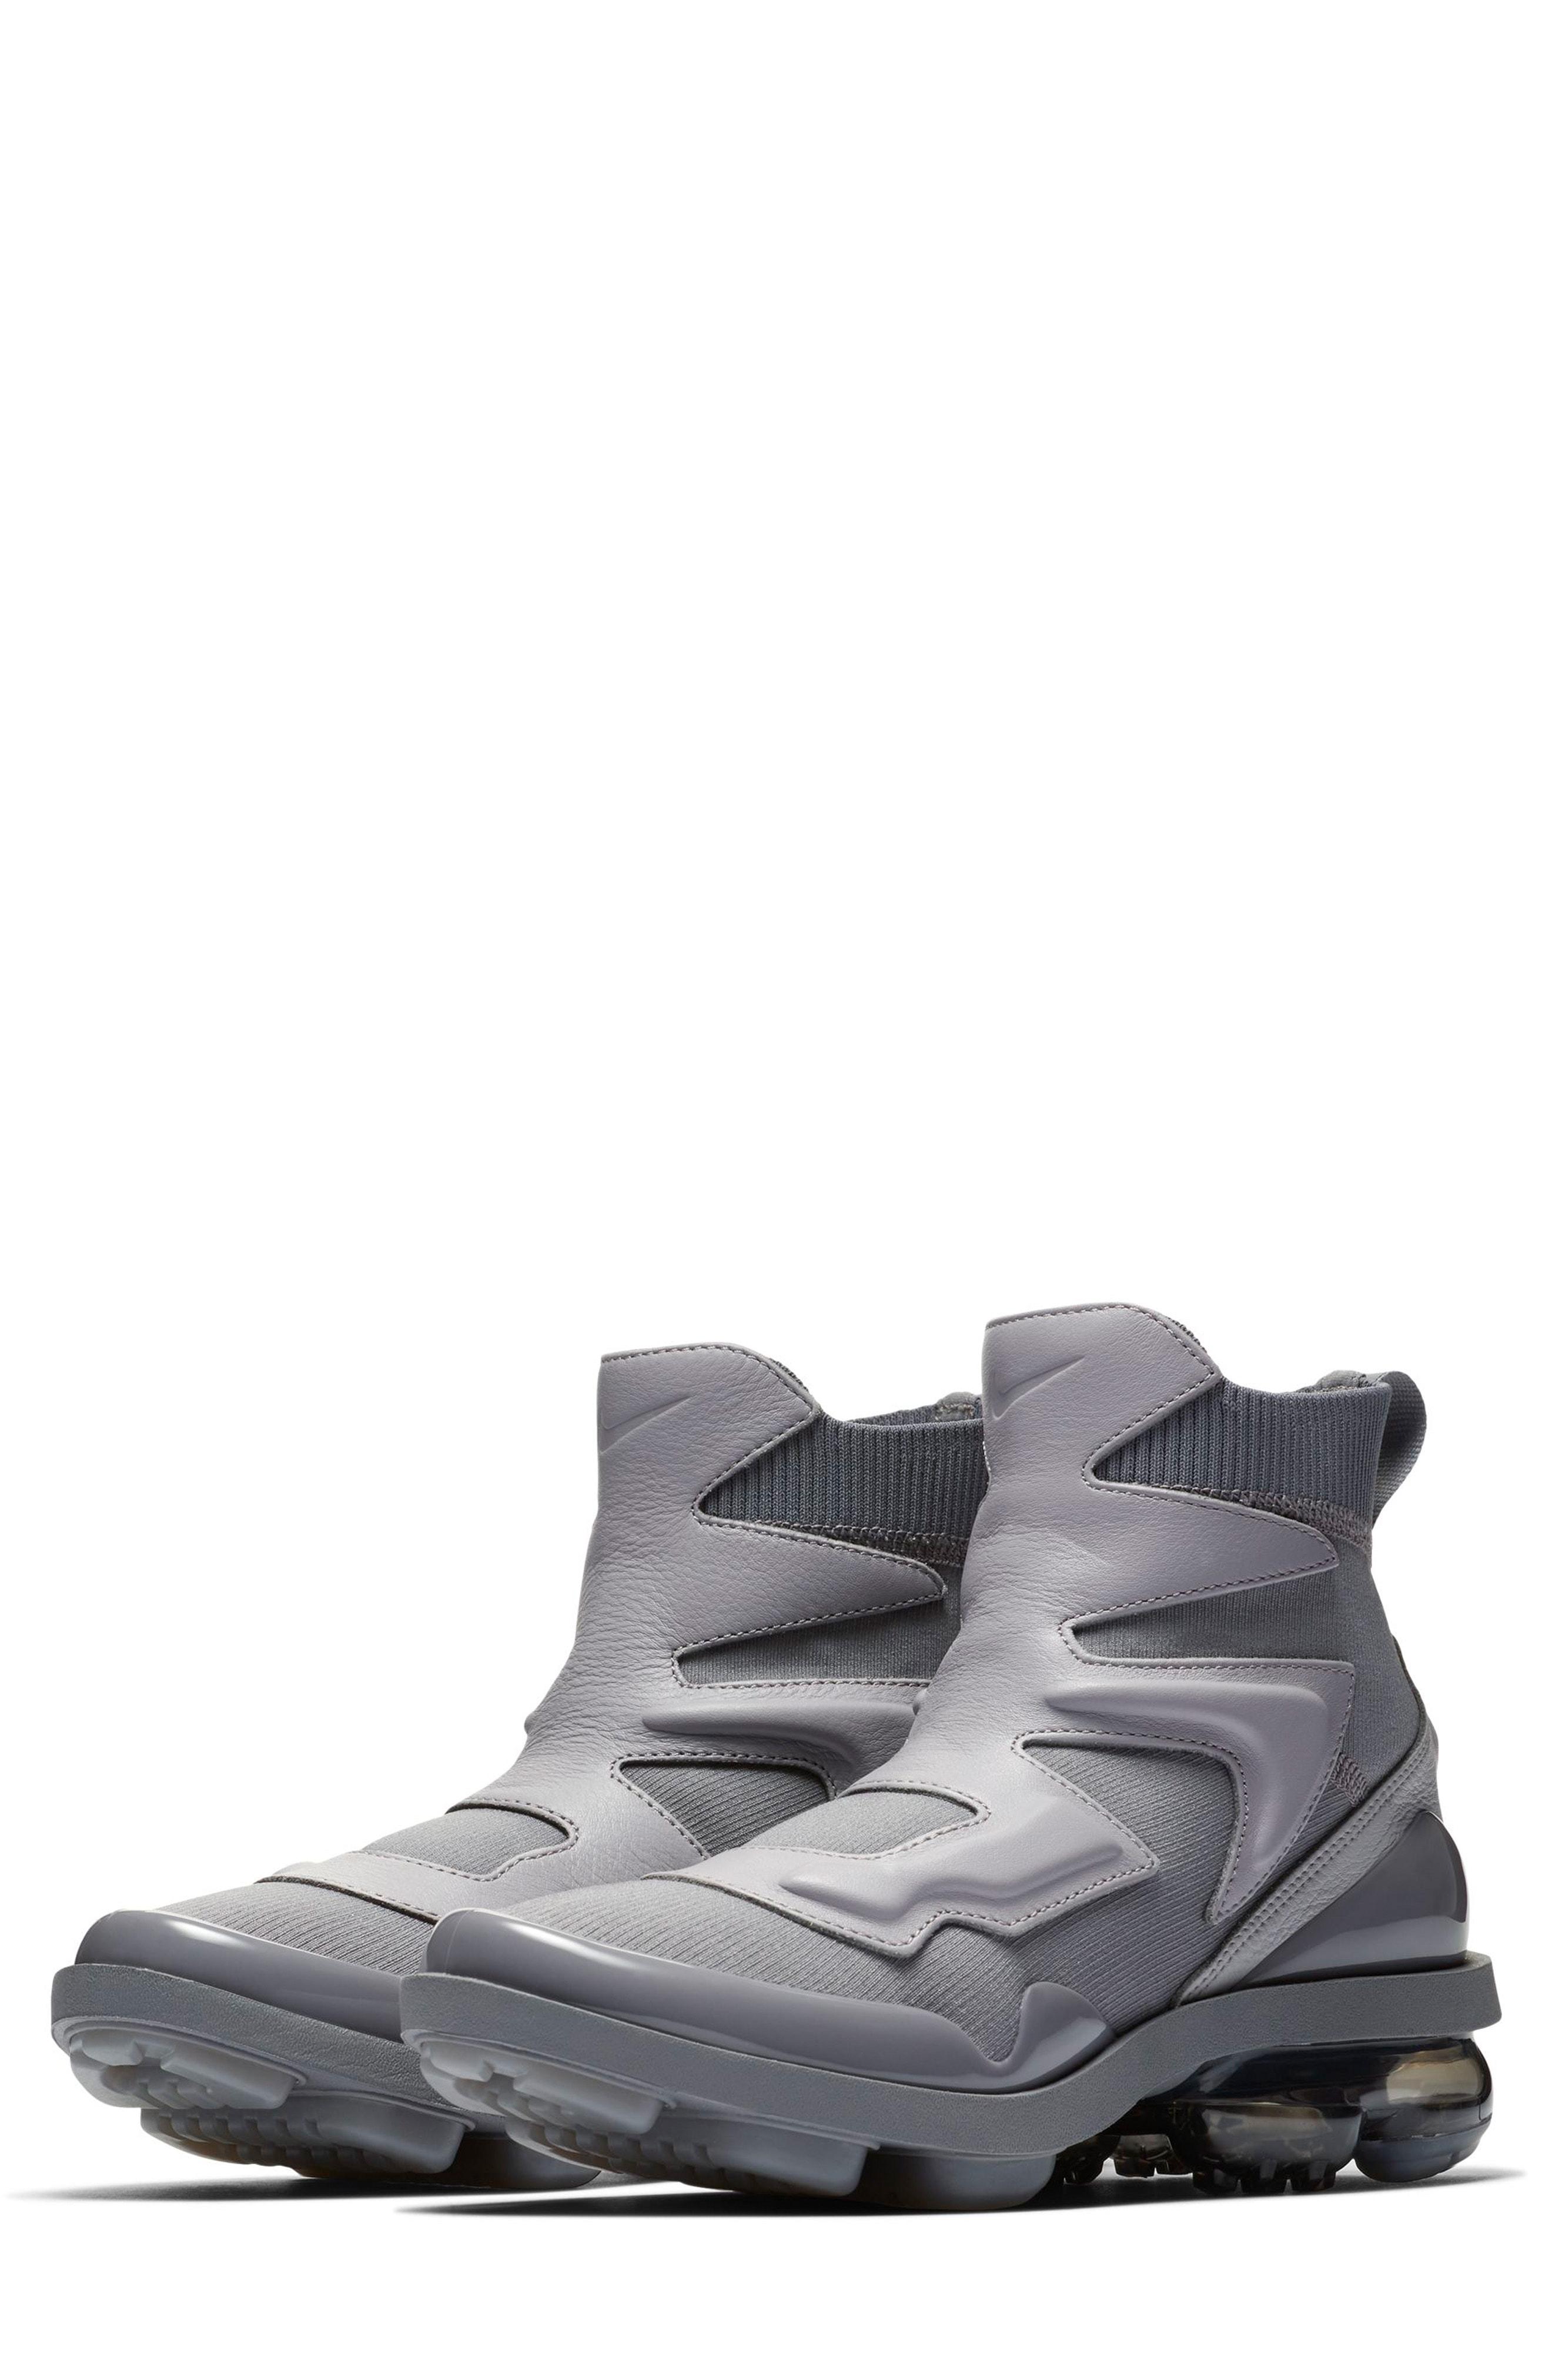 efb39a552b Nike Air Vapormax Light Ii Sneaker In Atmosphere Grey/ Gun Smoke ...